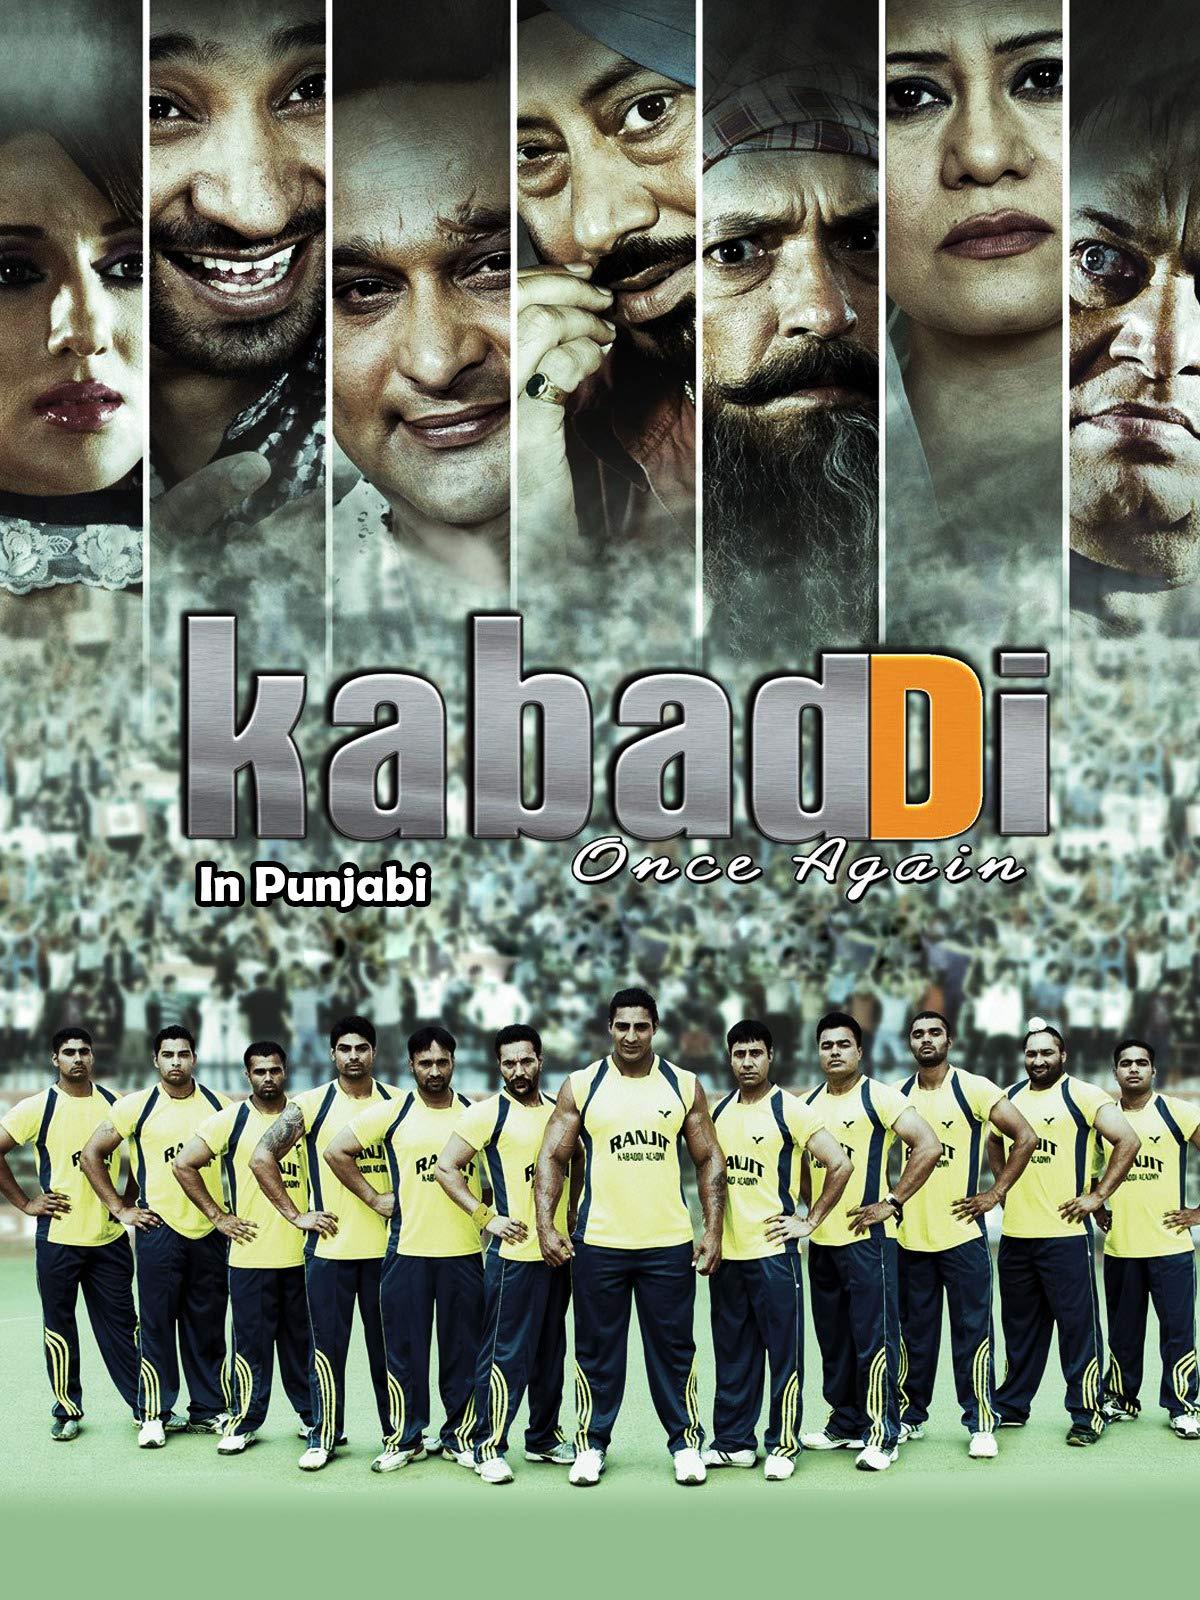 Kabaddi - Once Again